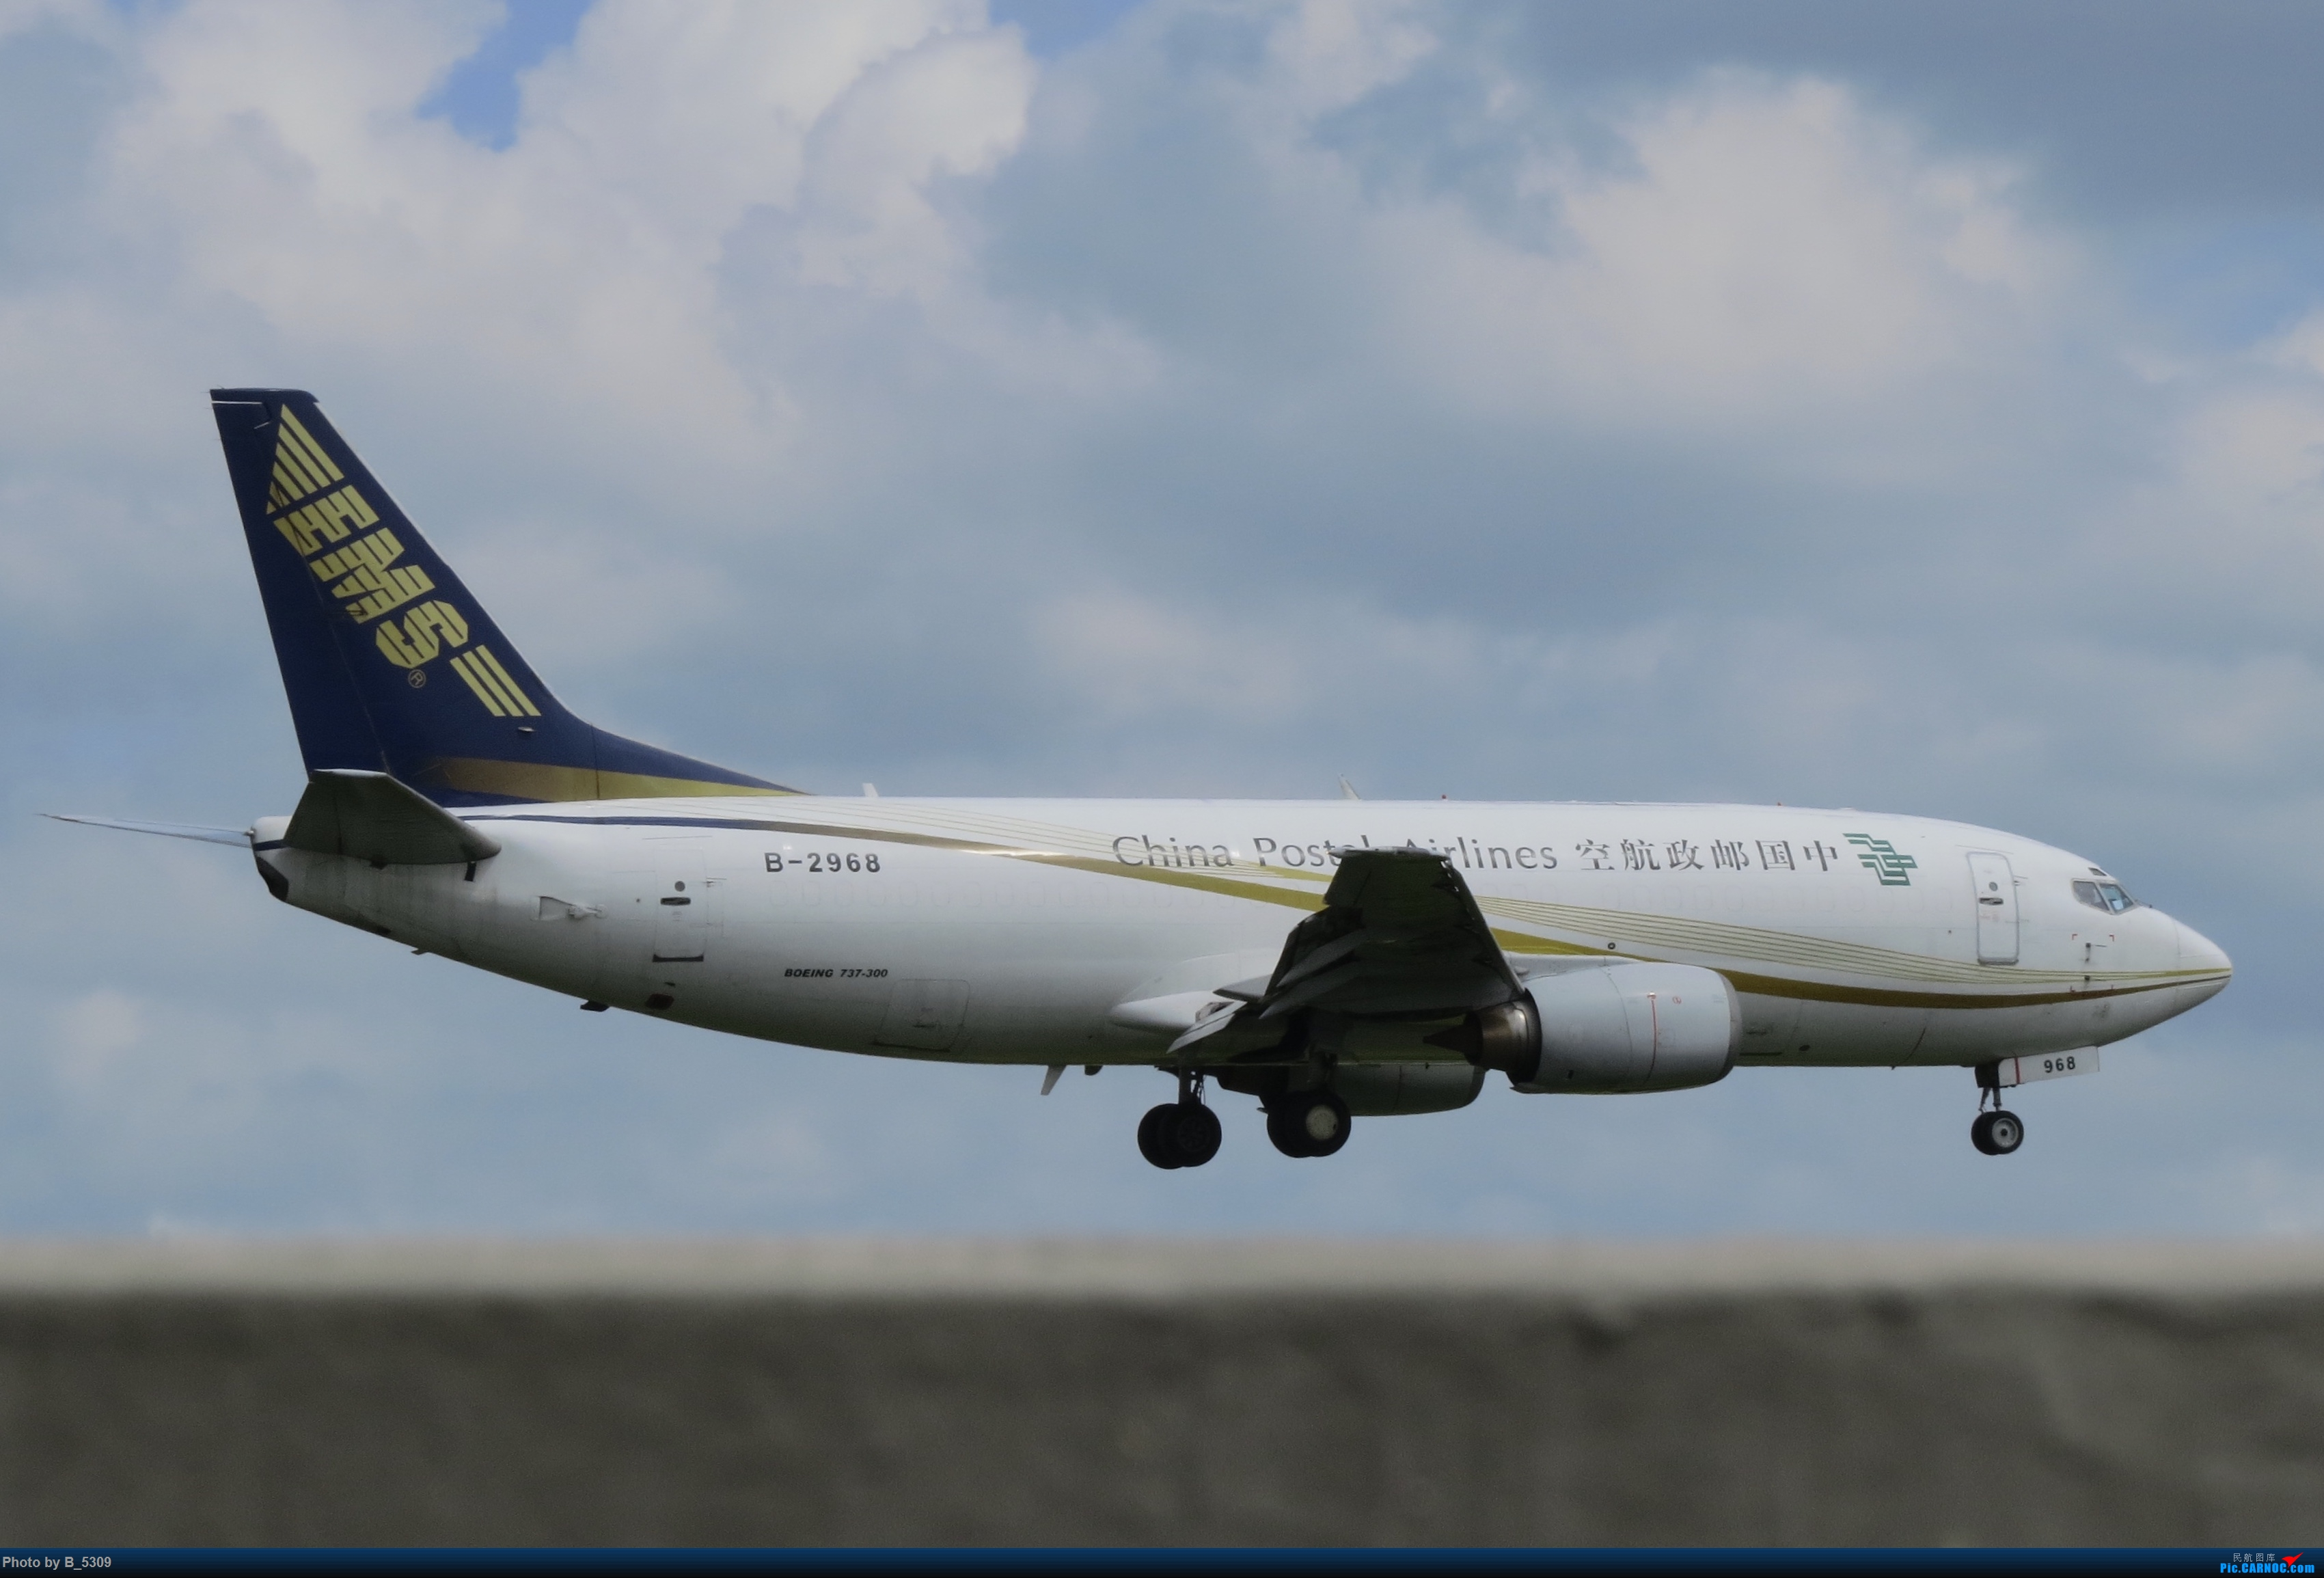 Re:[原创]白鹭窝终于换向了。。。 BOEING 737-300 B-2968 中国厦门高崎国际机场